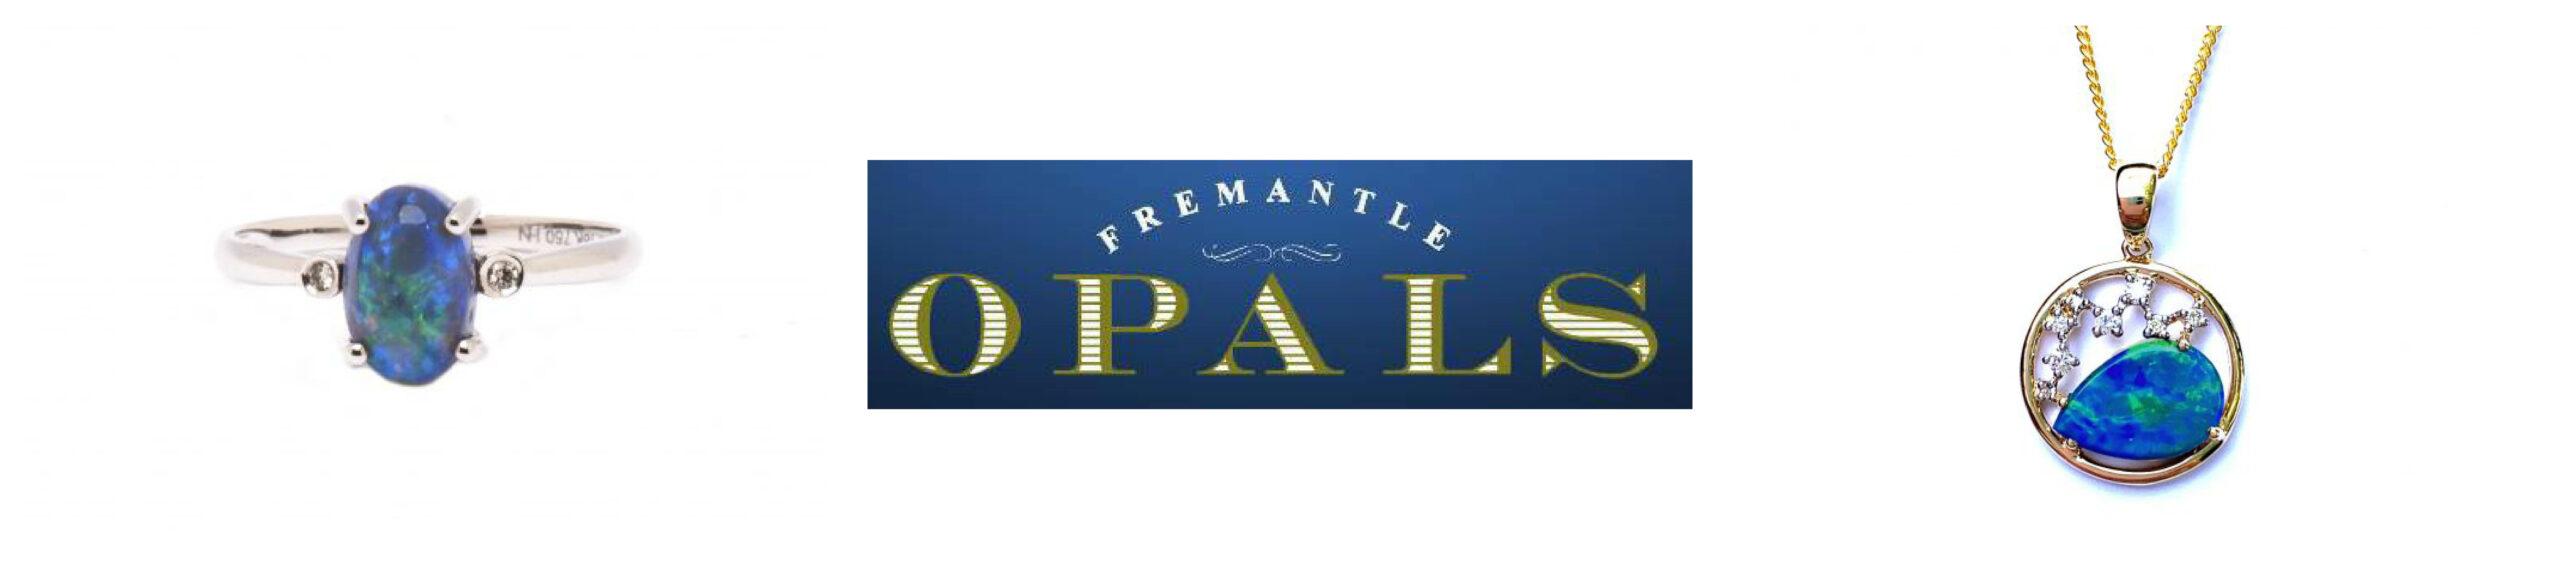 Fremantle Opals Fremantle